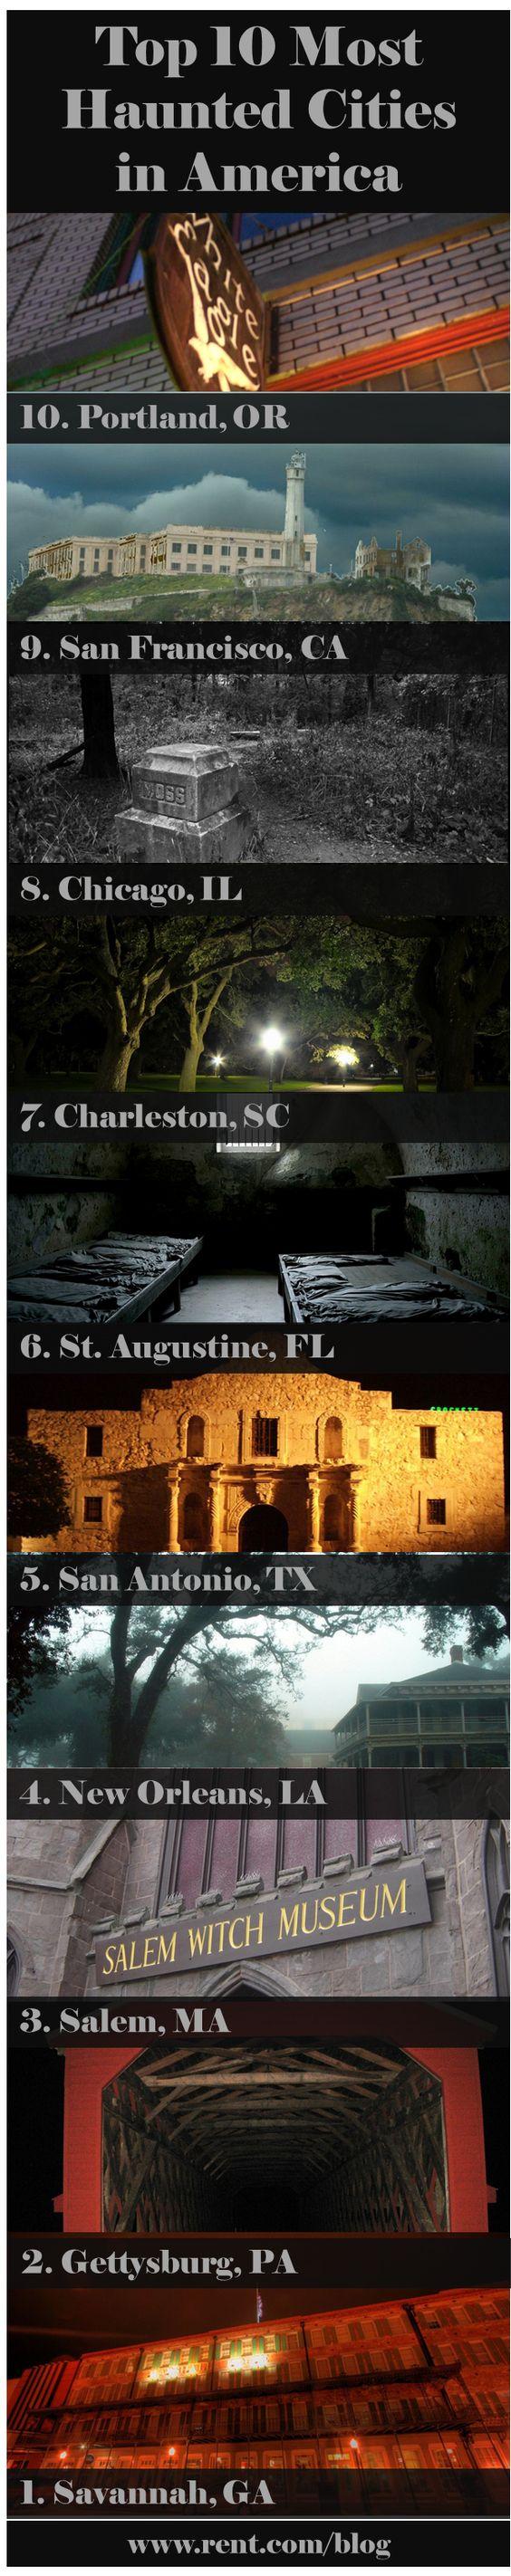 Rent.com lists the top 10 most #haunted cities in America. [Rent.com Blog]